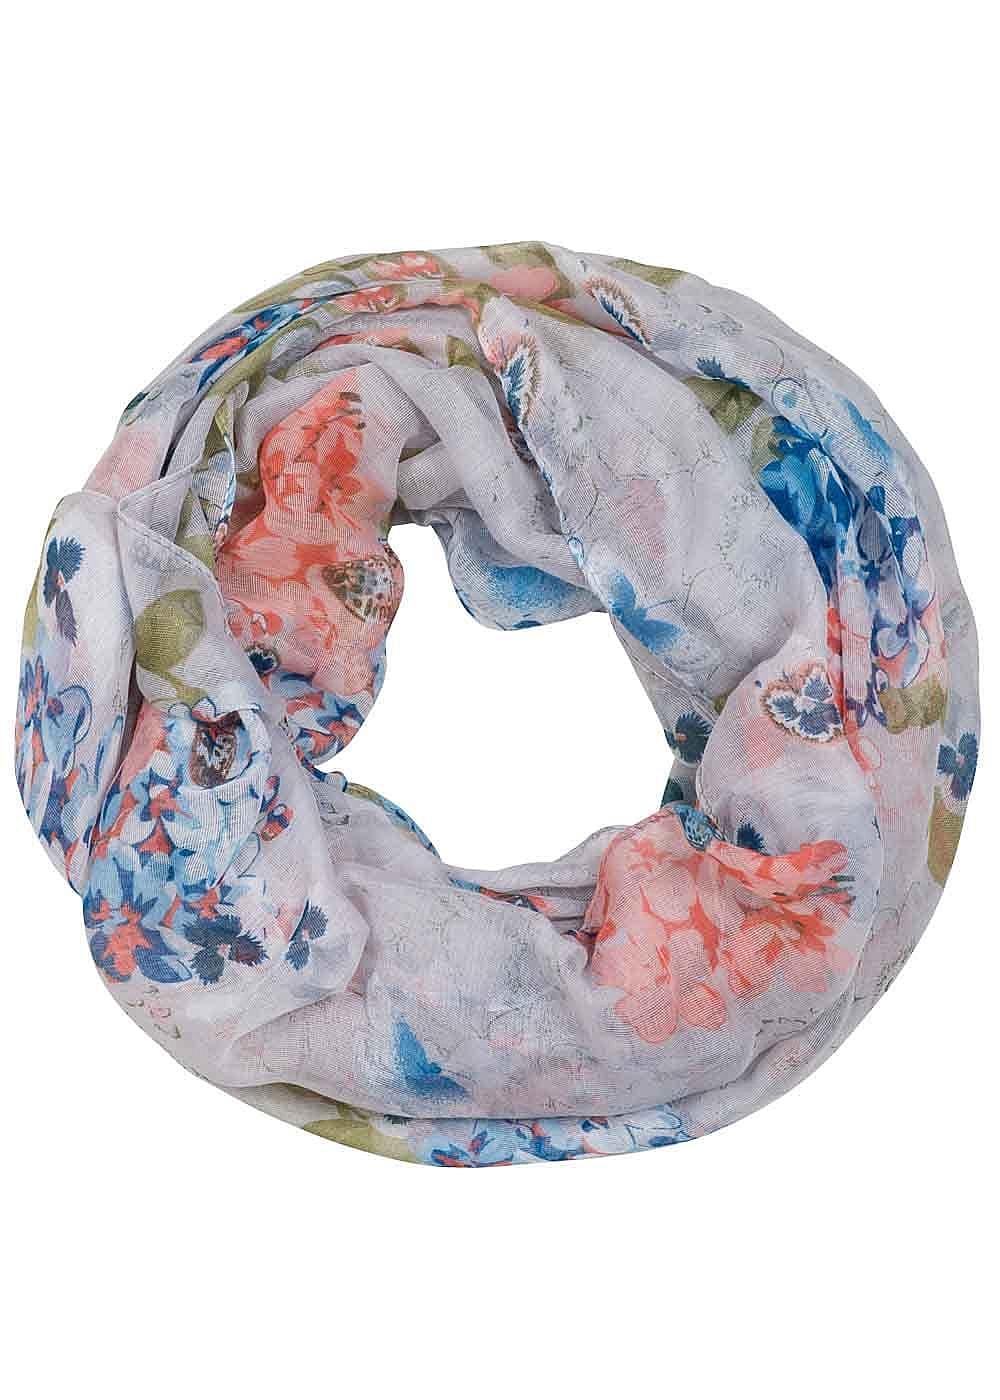 seventyseven lifestyle schal damen loop schal blumen schmetterlinge grau blau rosa 77onlineshop. Black Bedroom Furniture Sets. Home Design Ideas